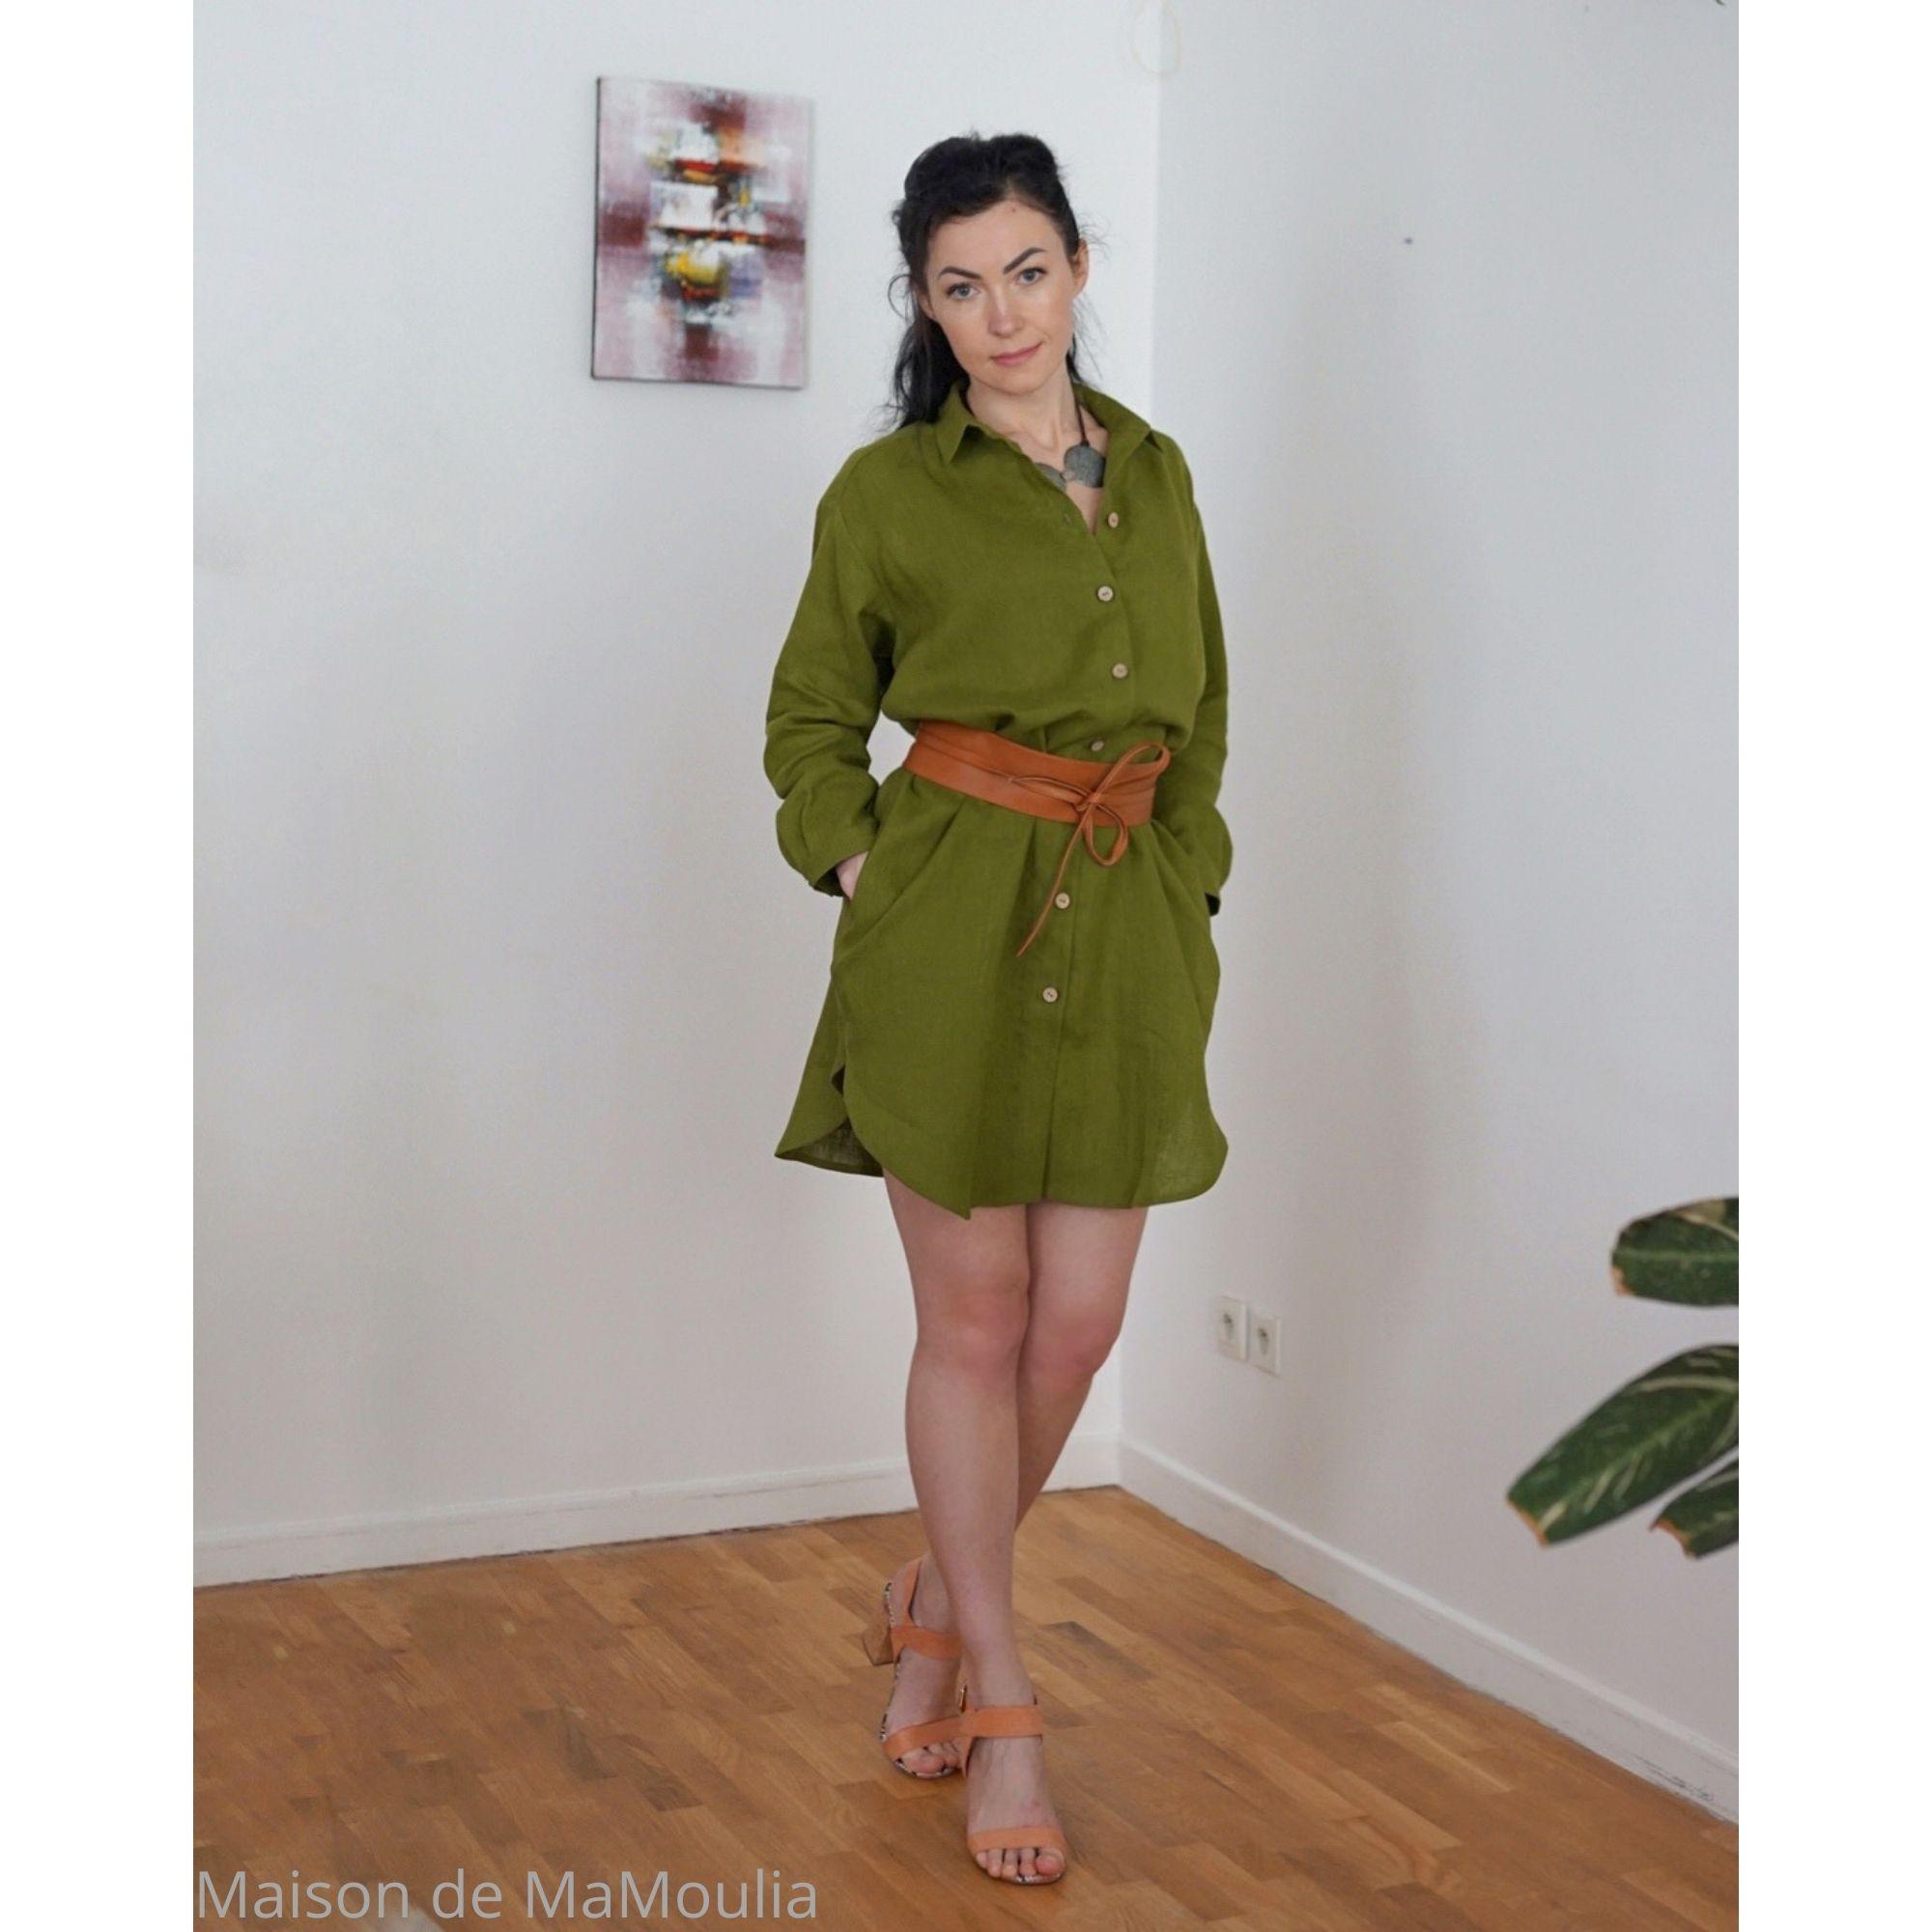 OFFON - Robe-chemise oversize - 100% lin lavé - Vert mousse